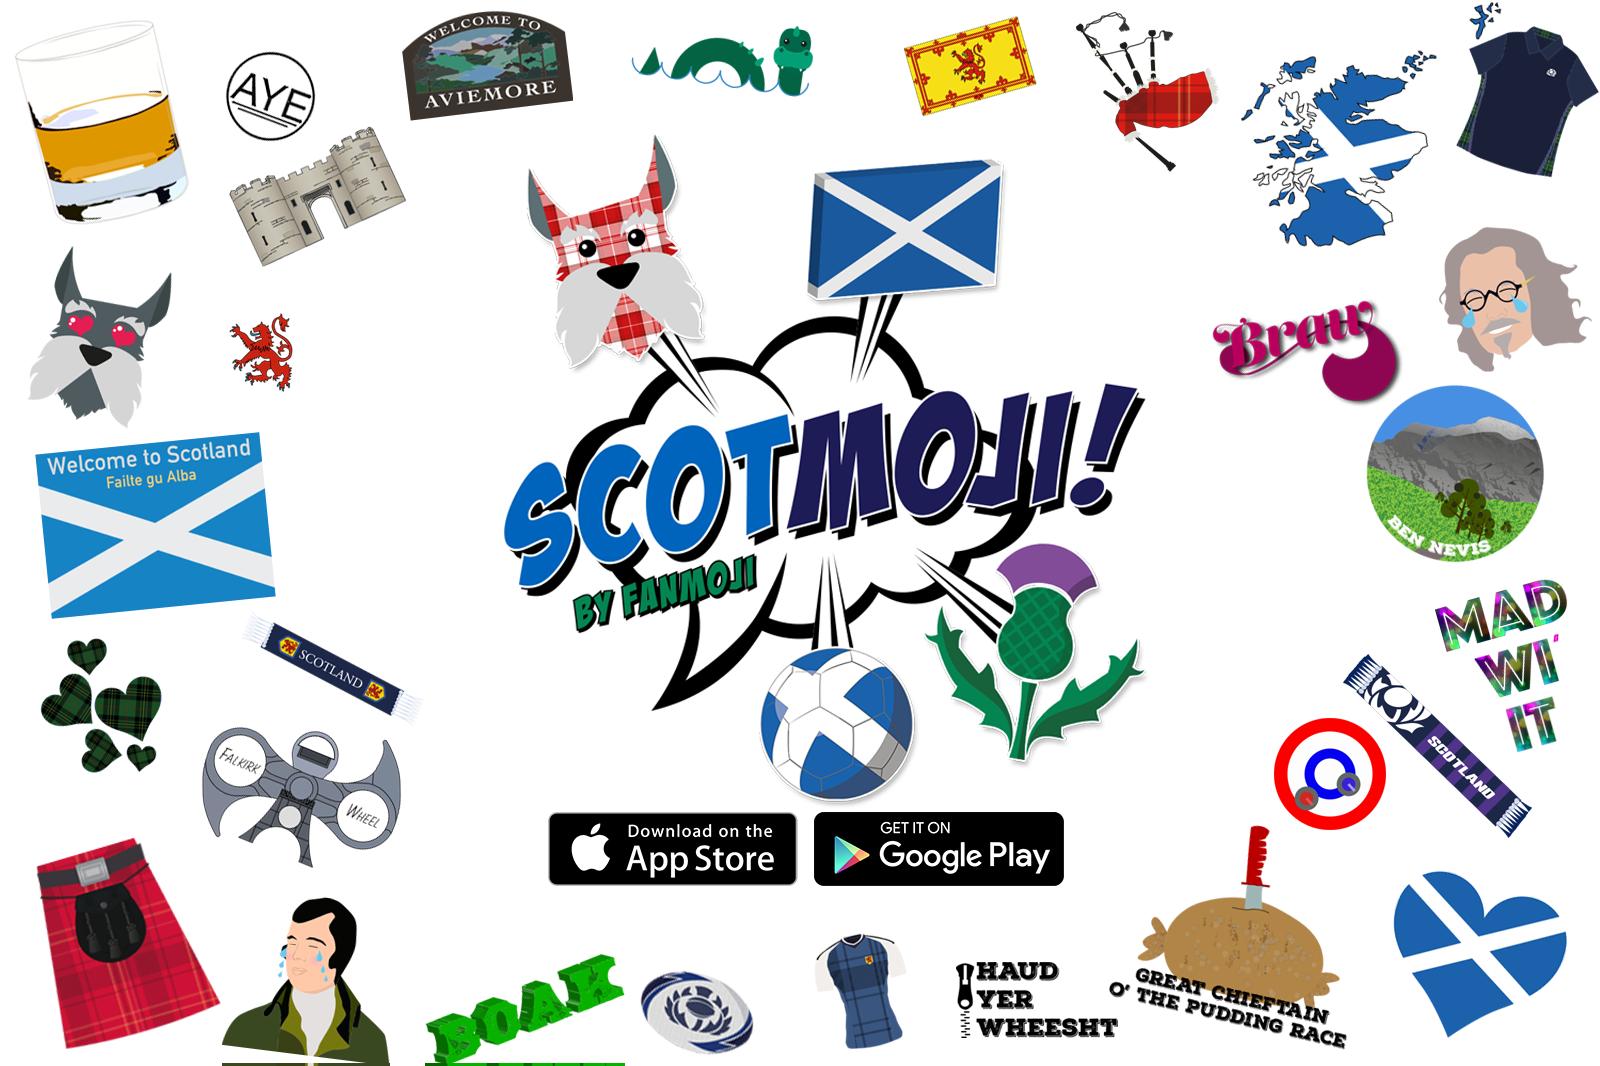 Scottish emojis available as 'Scotmoji' app is launched | HeraldScotland